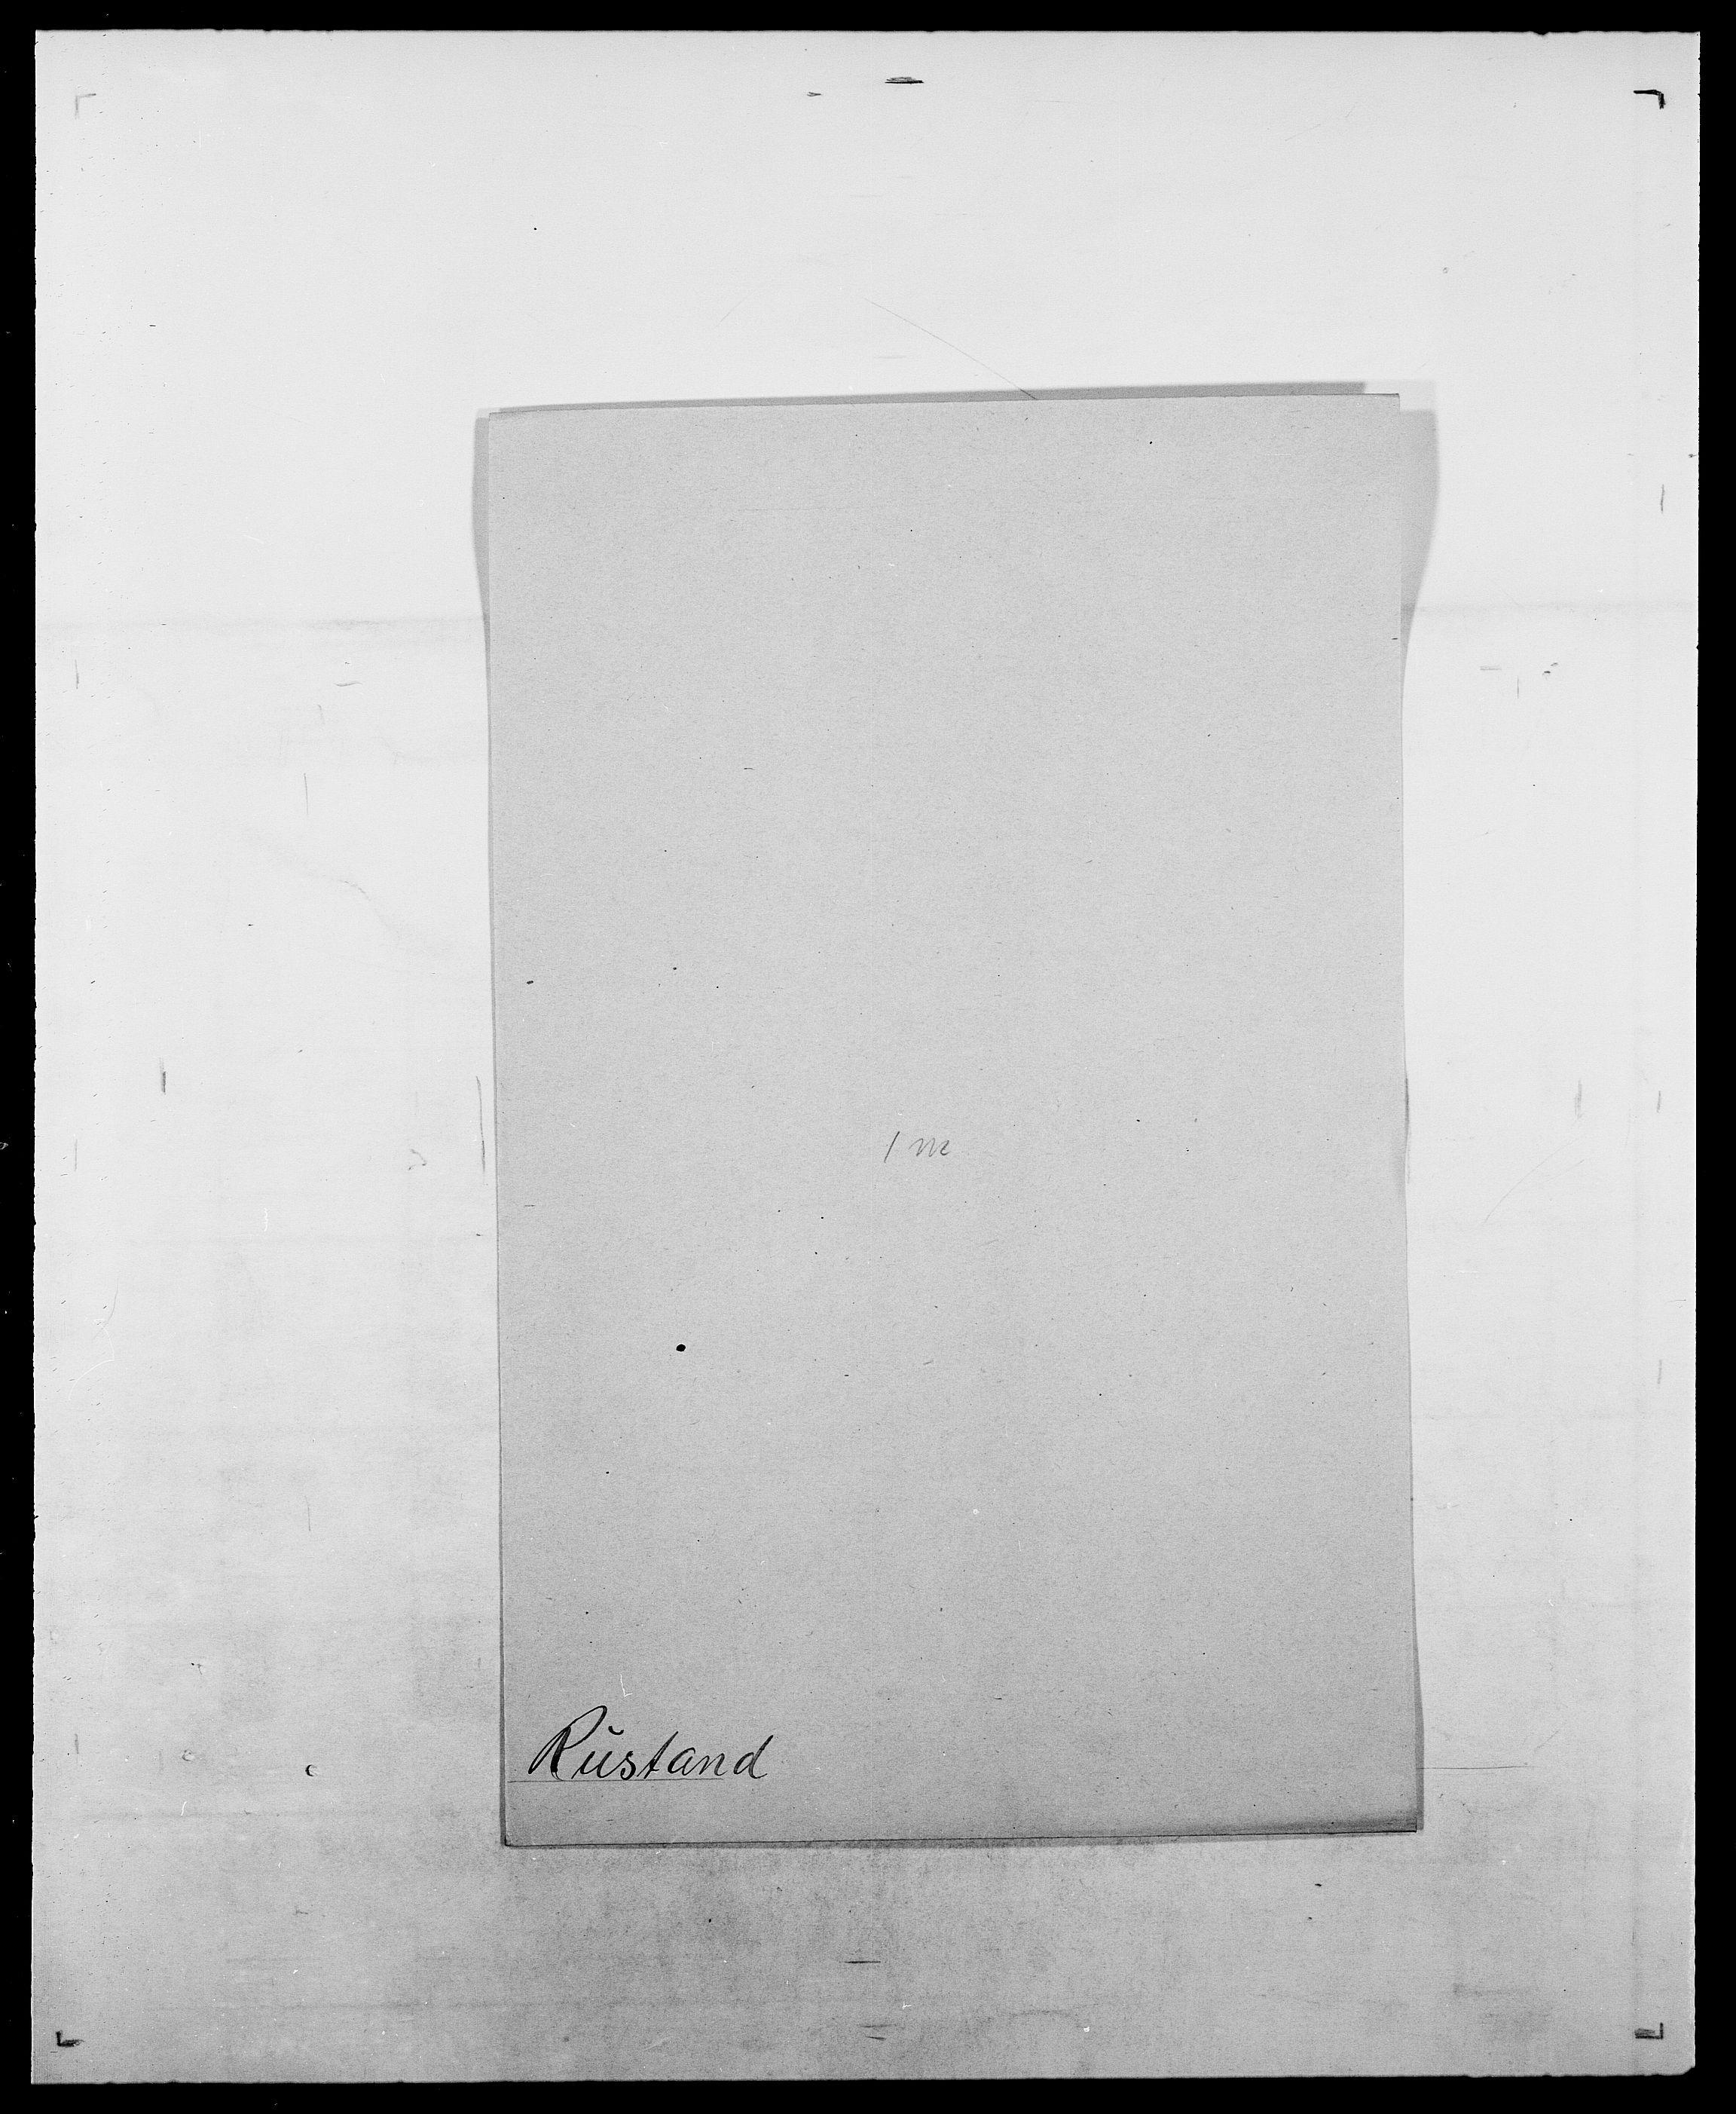 SAO, Delgobe, Charles Antoine - samling, D/Da/L0033: Roald - Røyem, s. 494